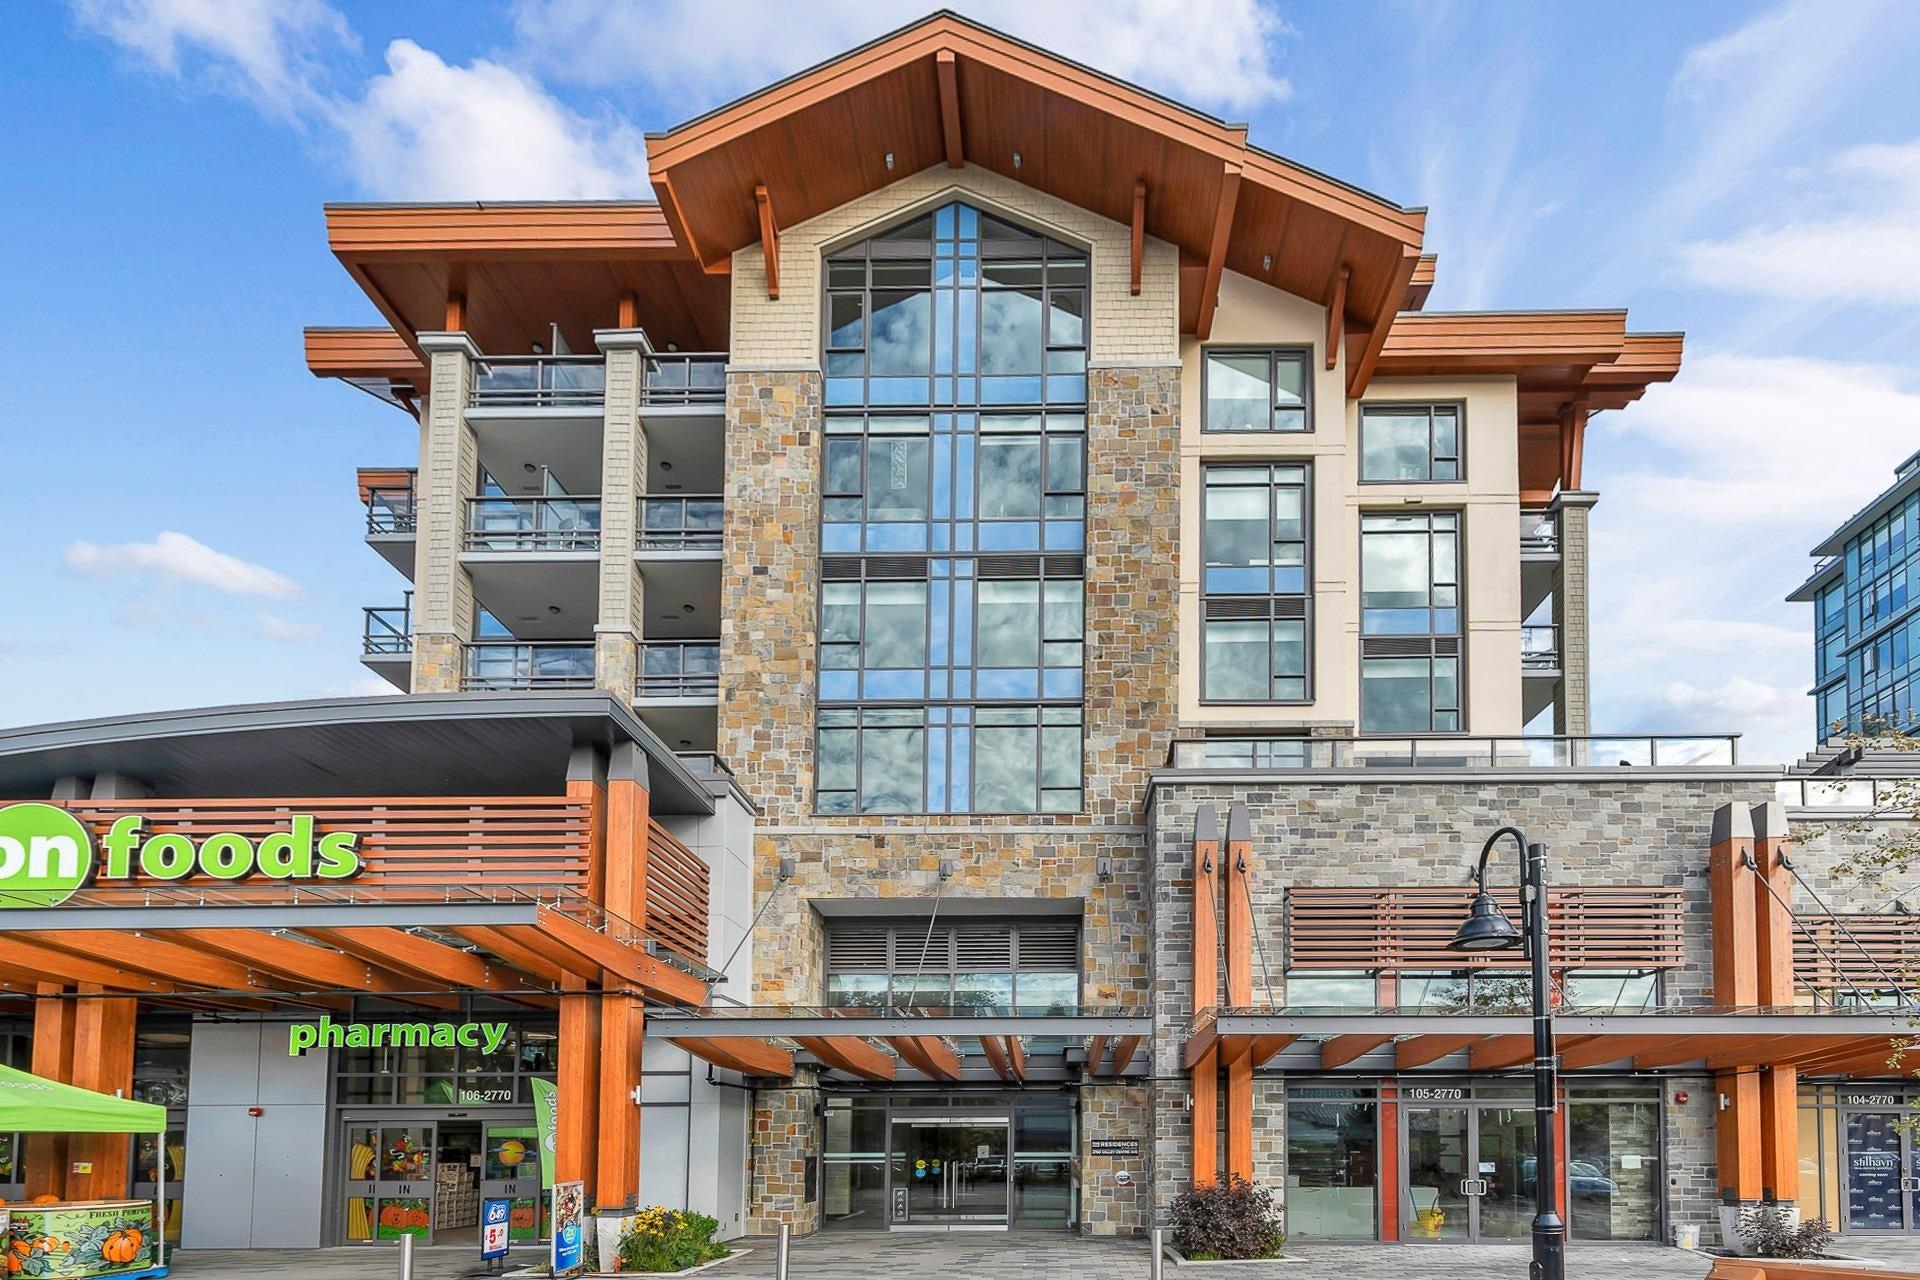 702 2780 VALLEY CENTRE AVENUE - Lynn Valley Apartment/Condo for sale, 3 Bedrooms (R2622279) - #2